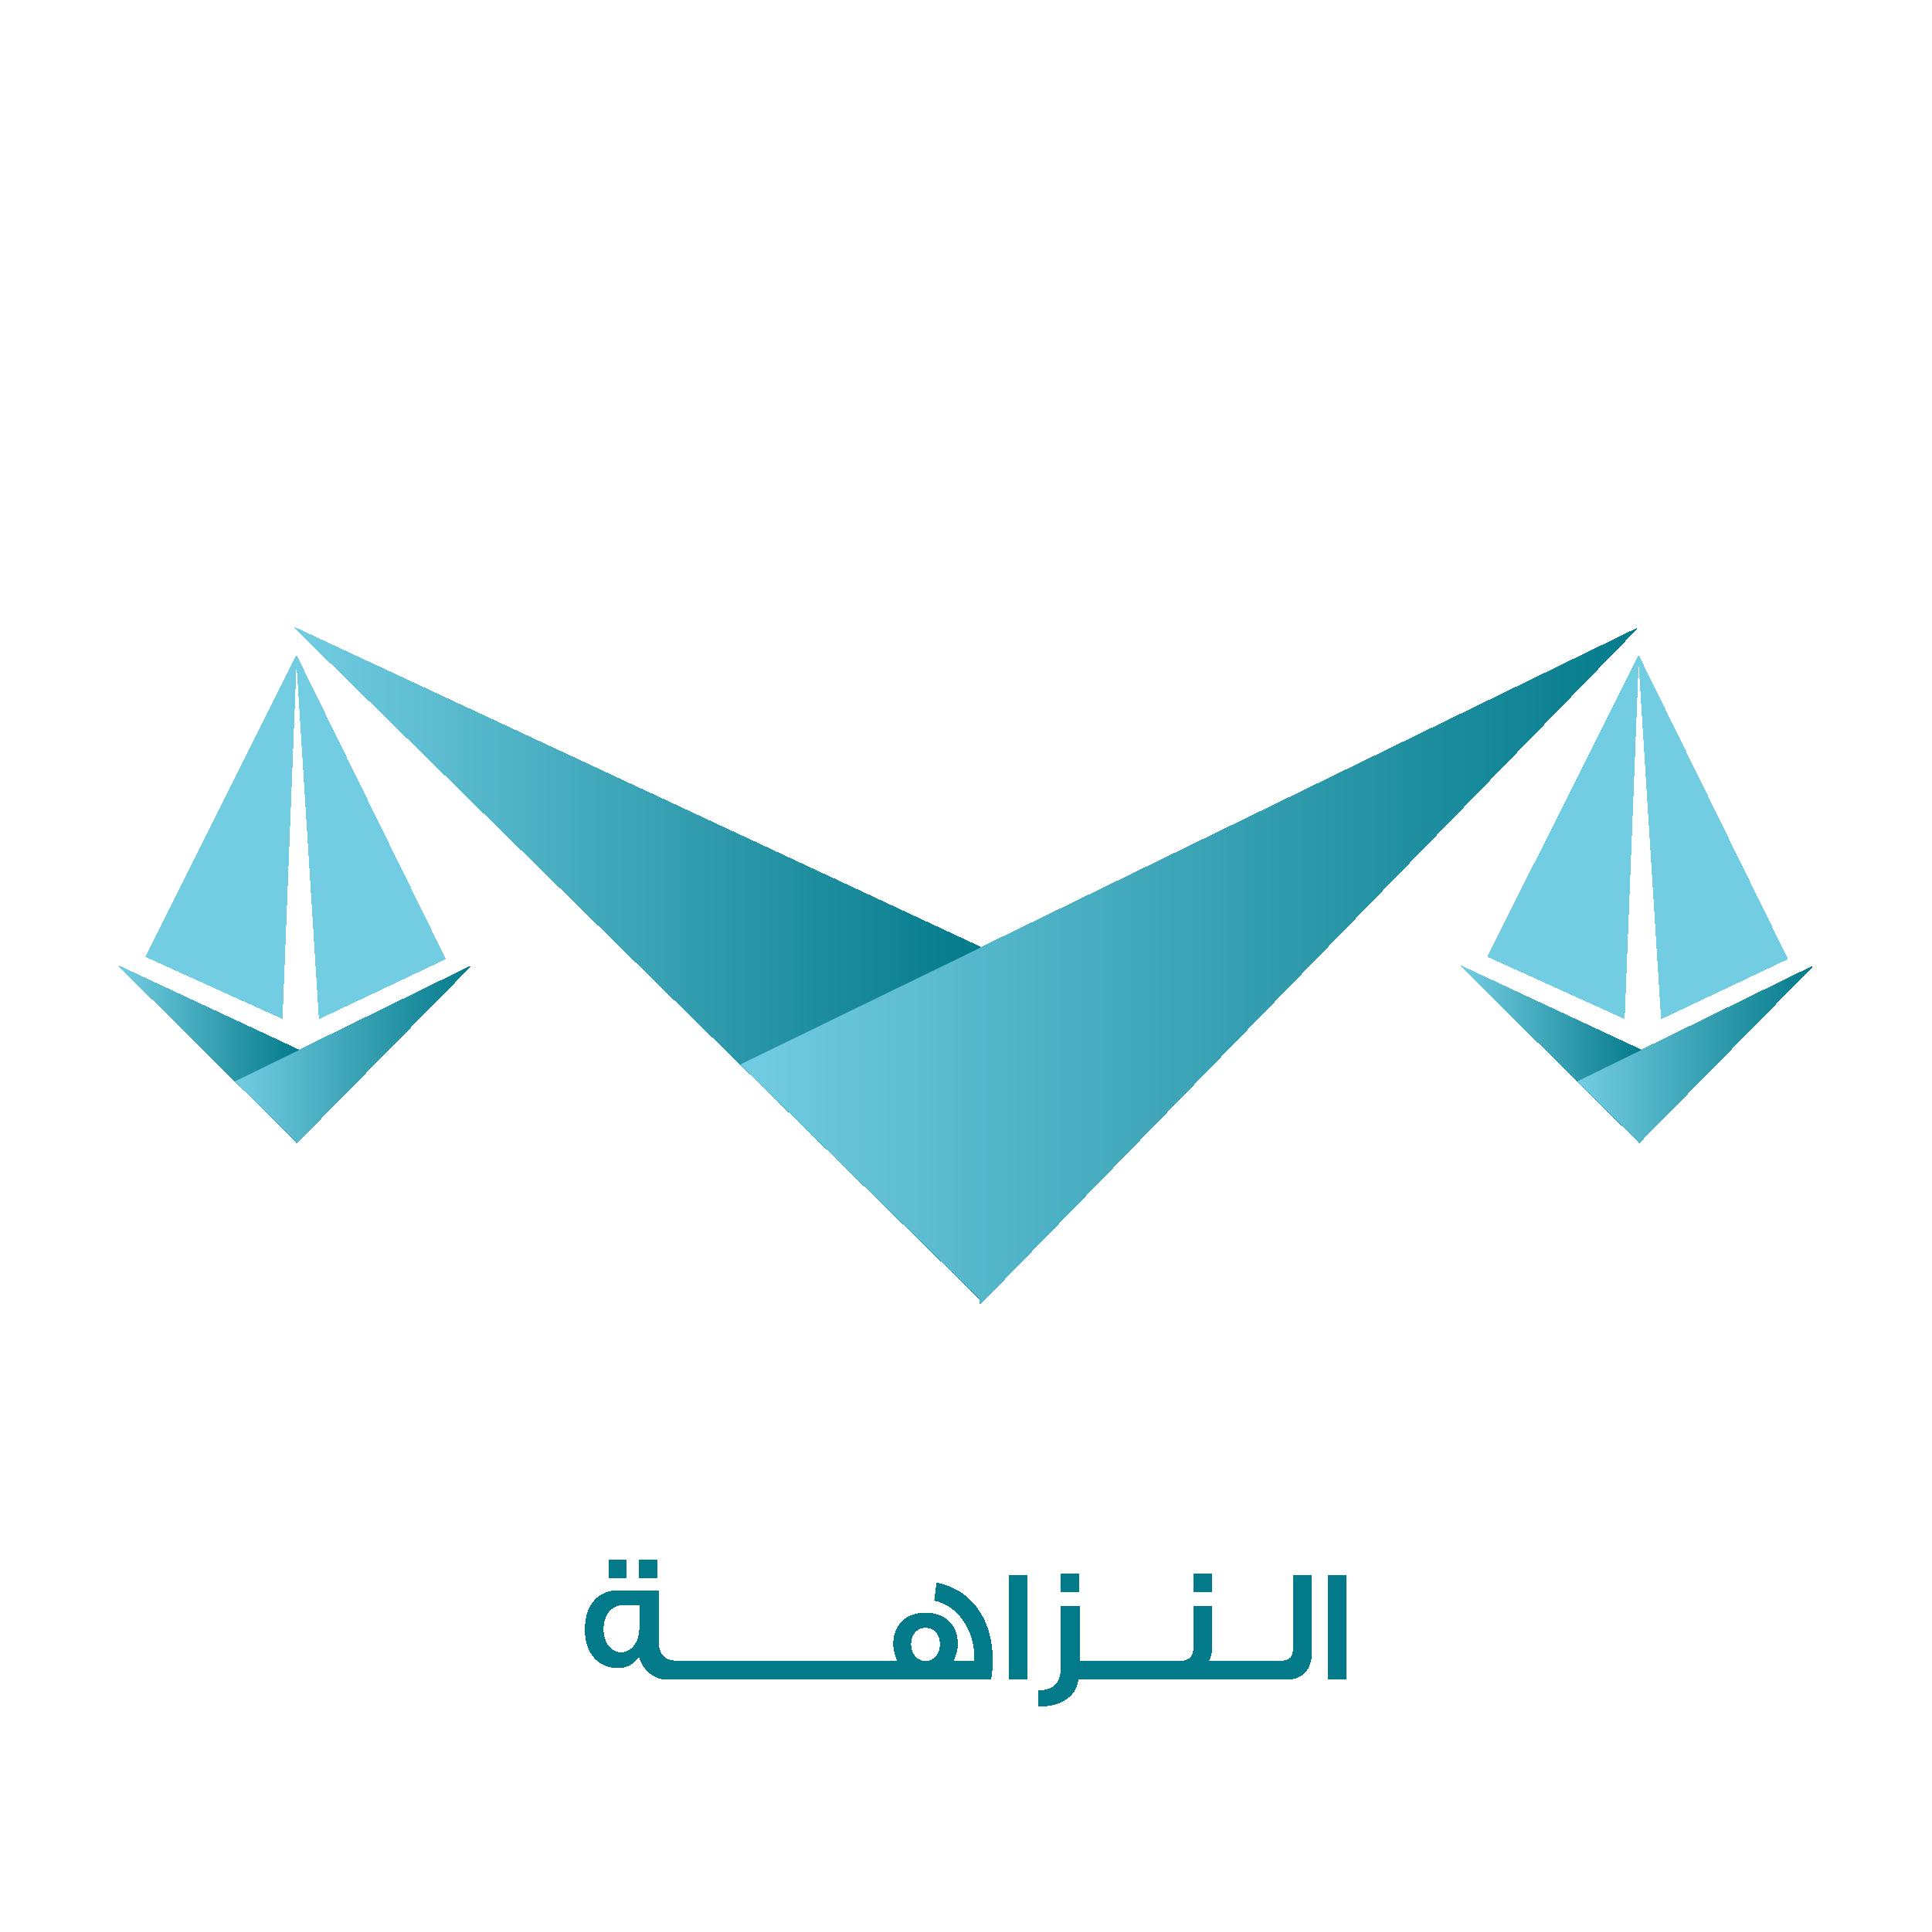 Al-Khattaf